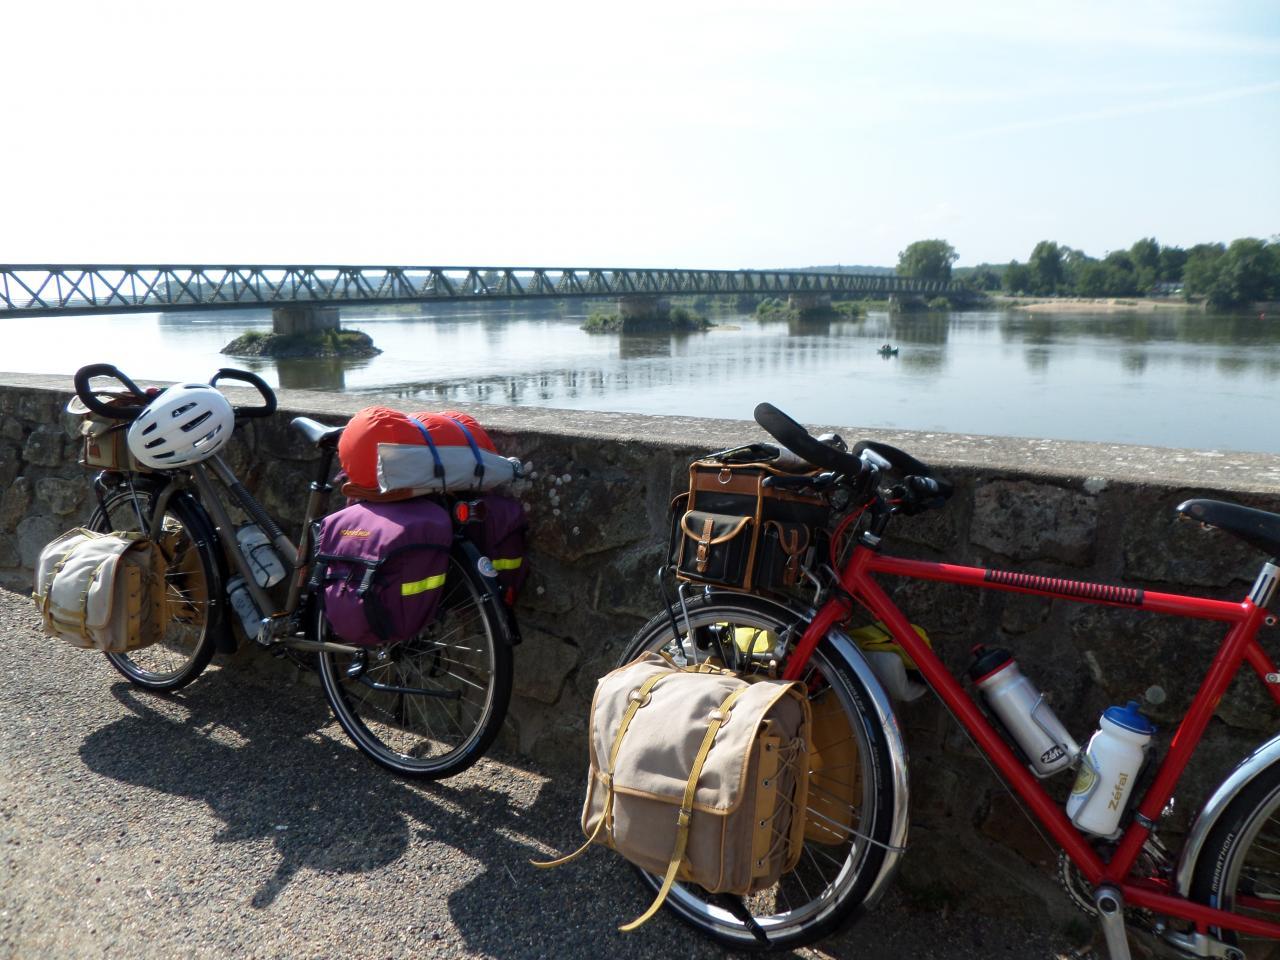 Saint Mathurin sur Loire (49) Eurovélo 6